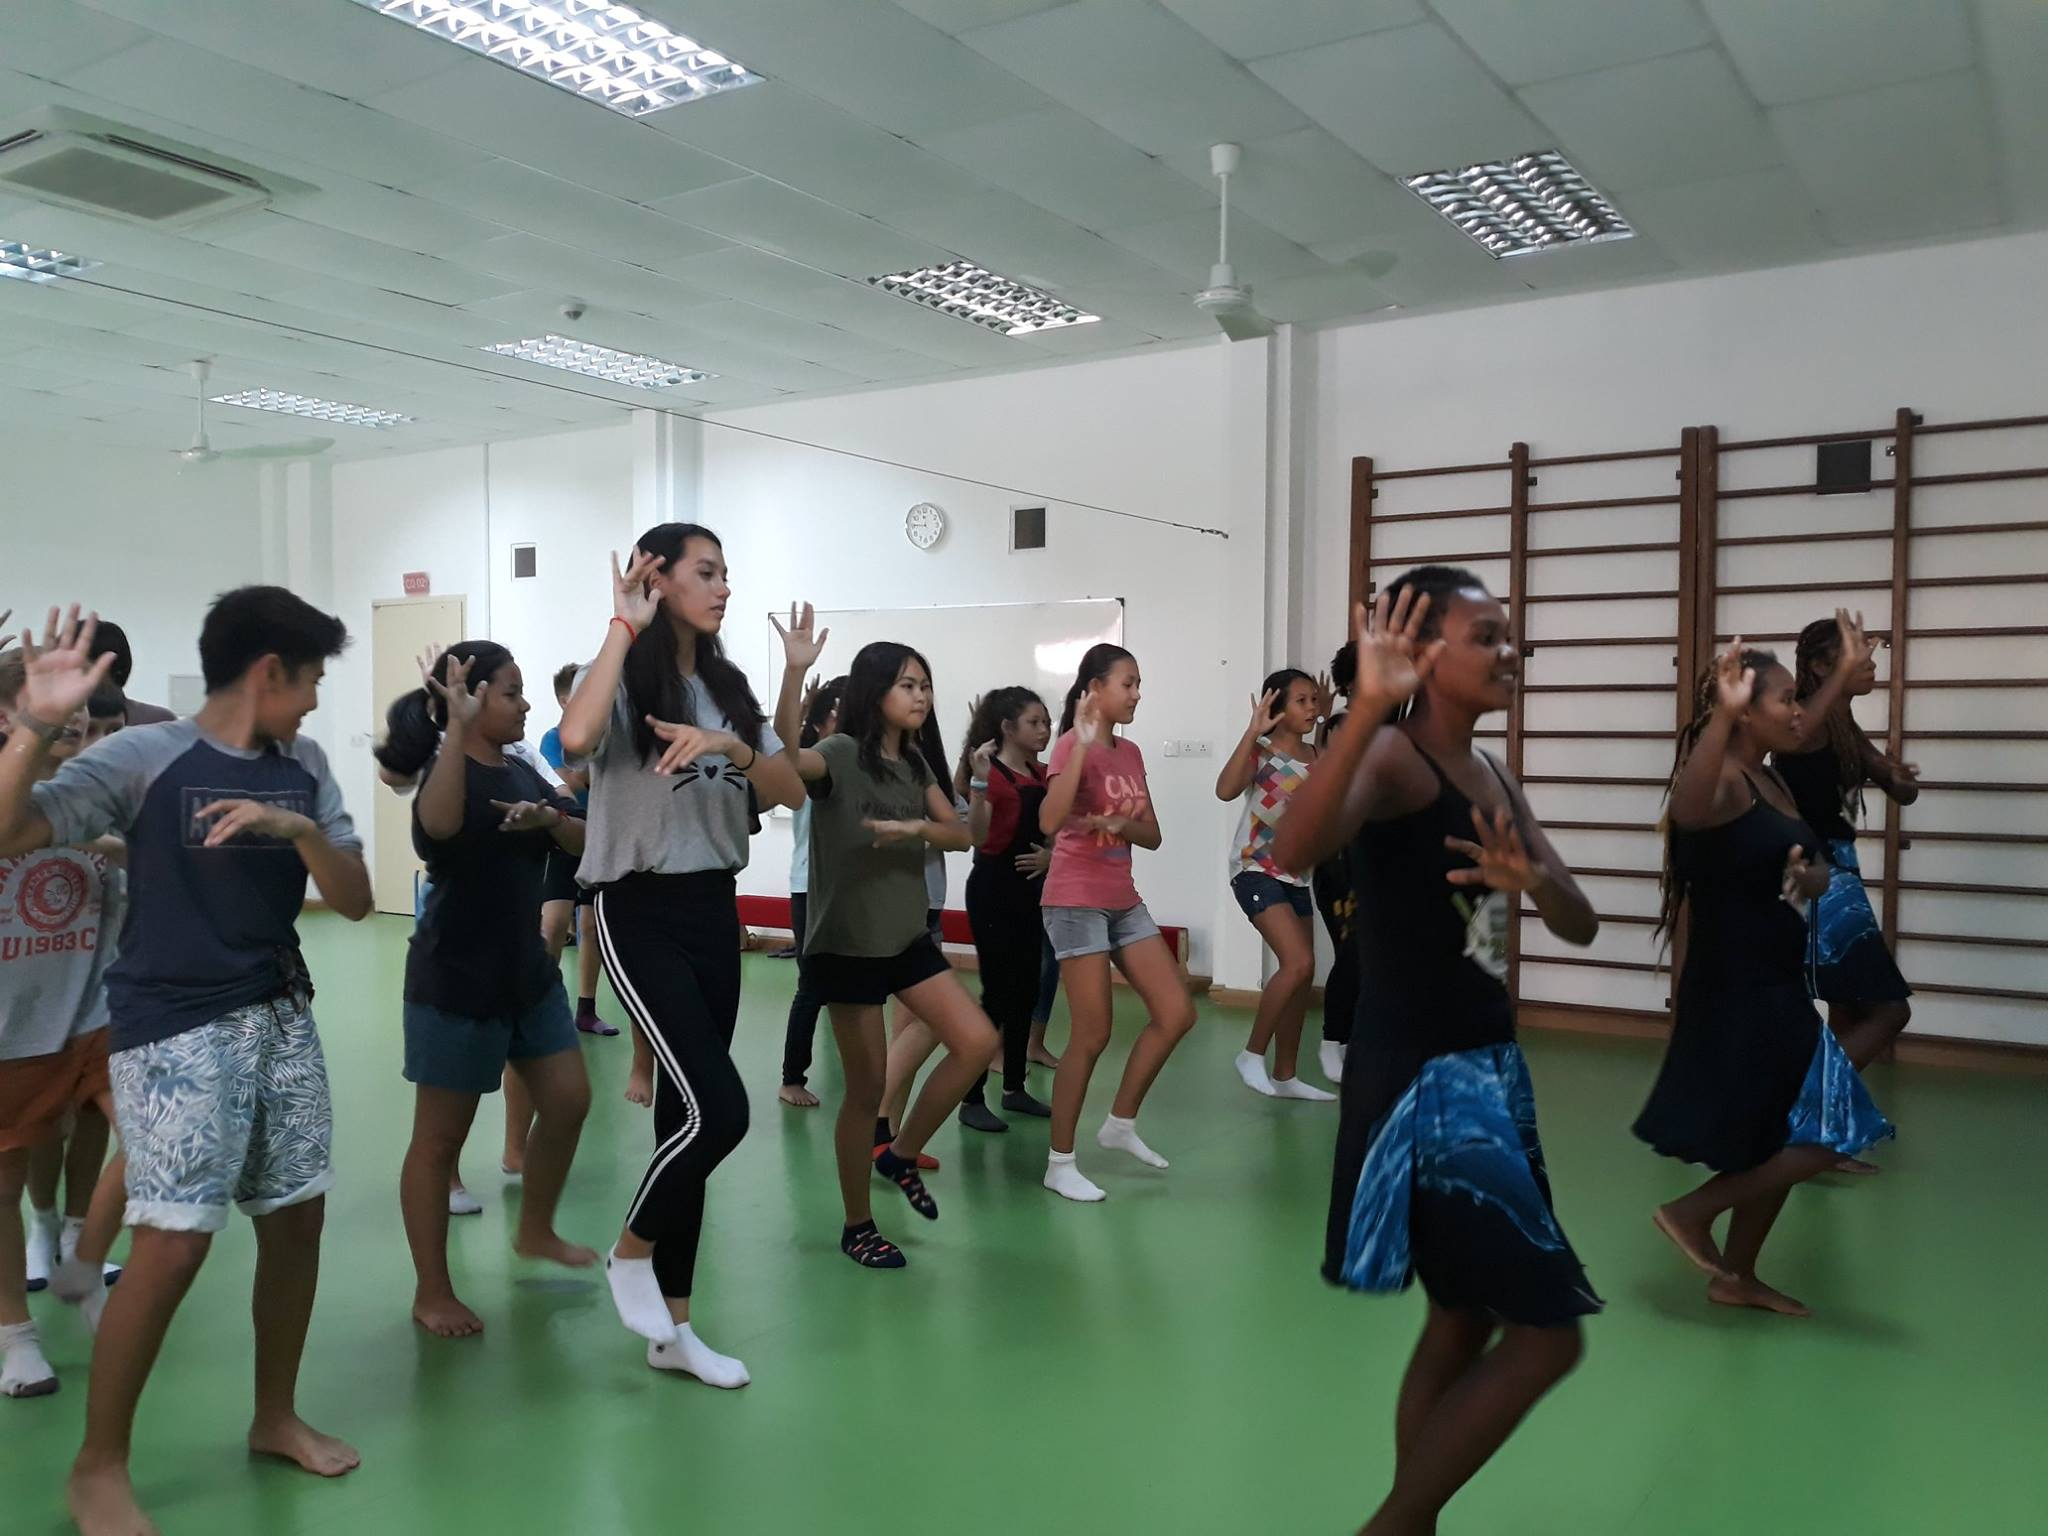 Séjour de la Bloco Malagasy en Thaïlande et au Cambodge